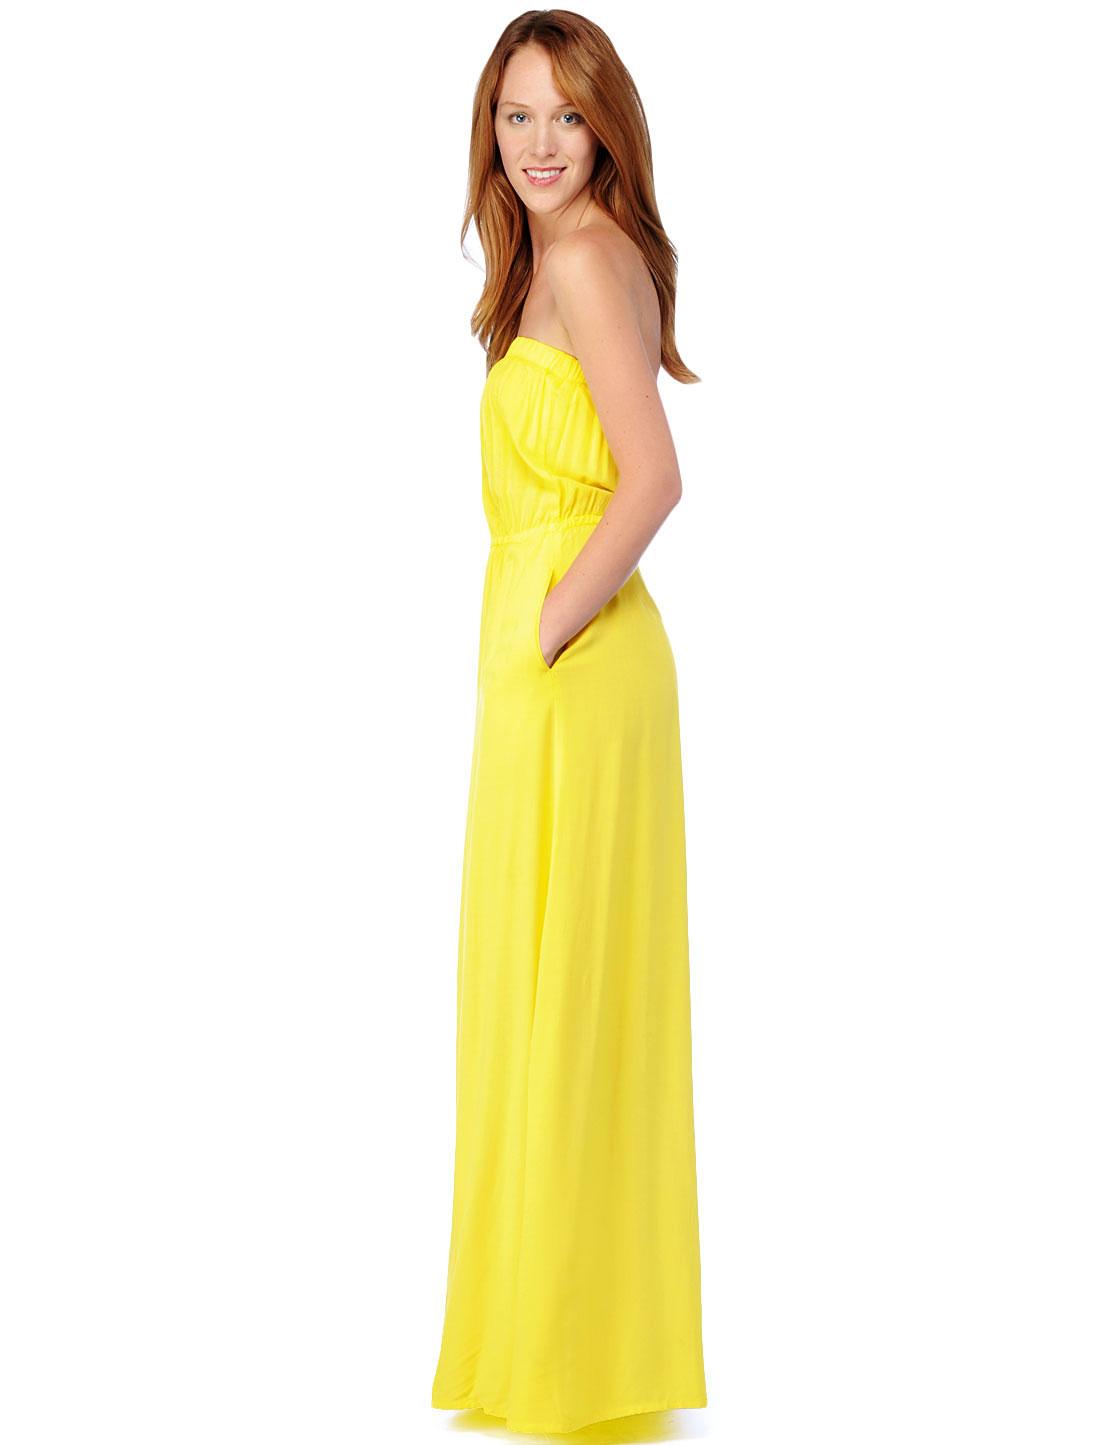 Splendid Strapless Maxi Dress in Yellow